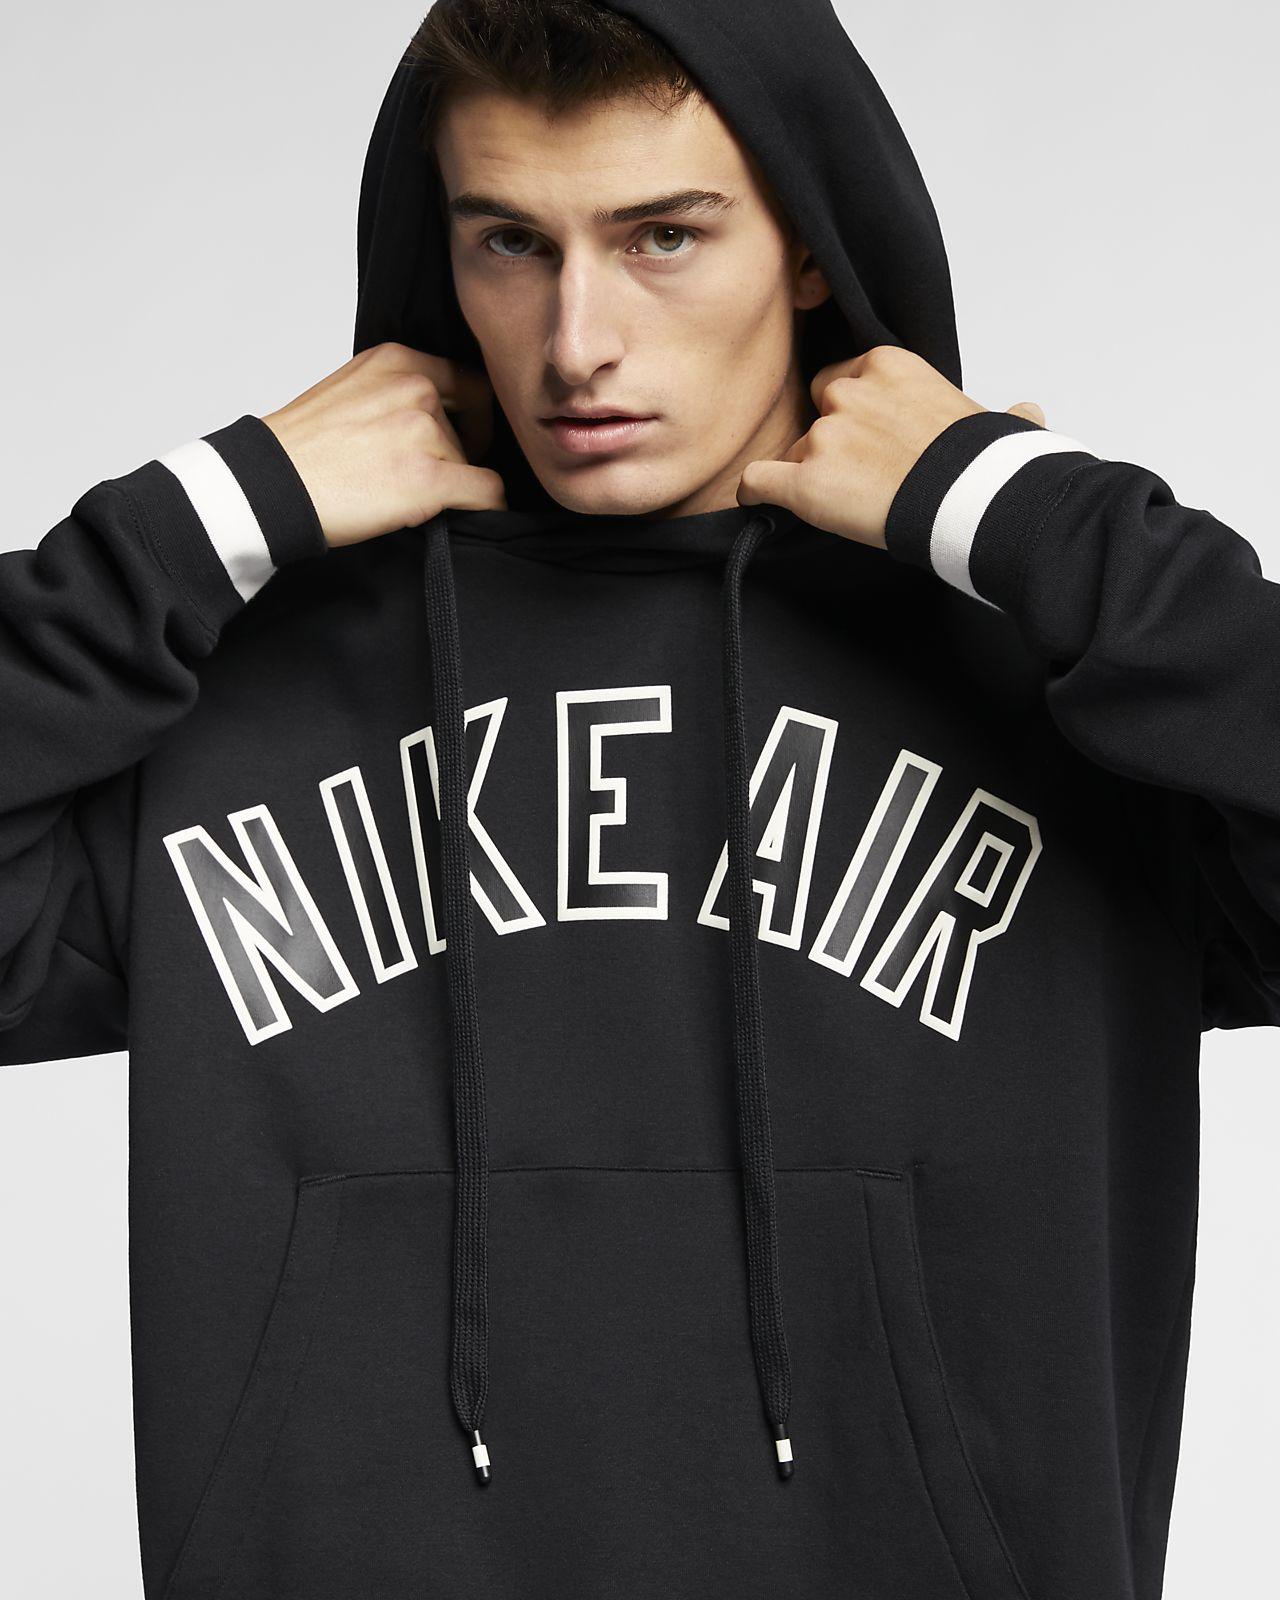 61ac818a7d625e Nike Air Men s Fleece Pullover Hoodie. Nike.com